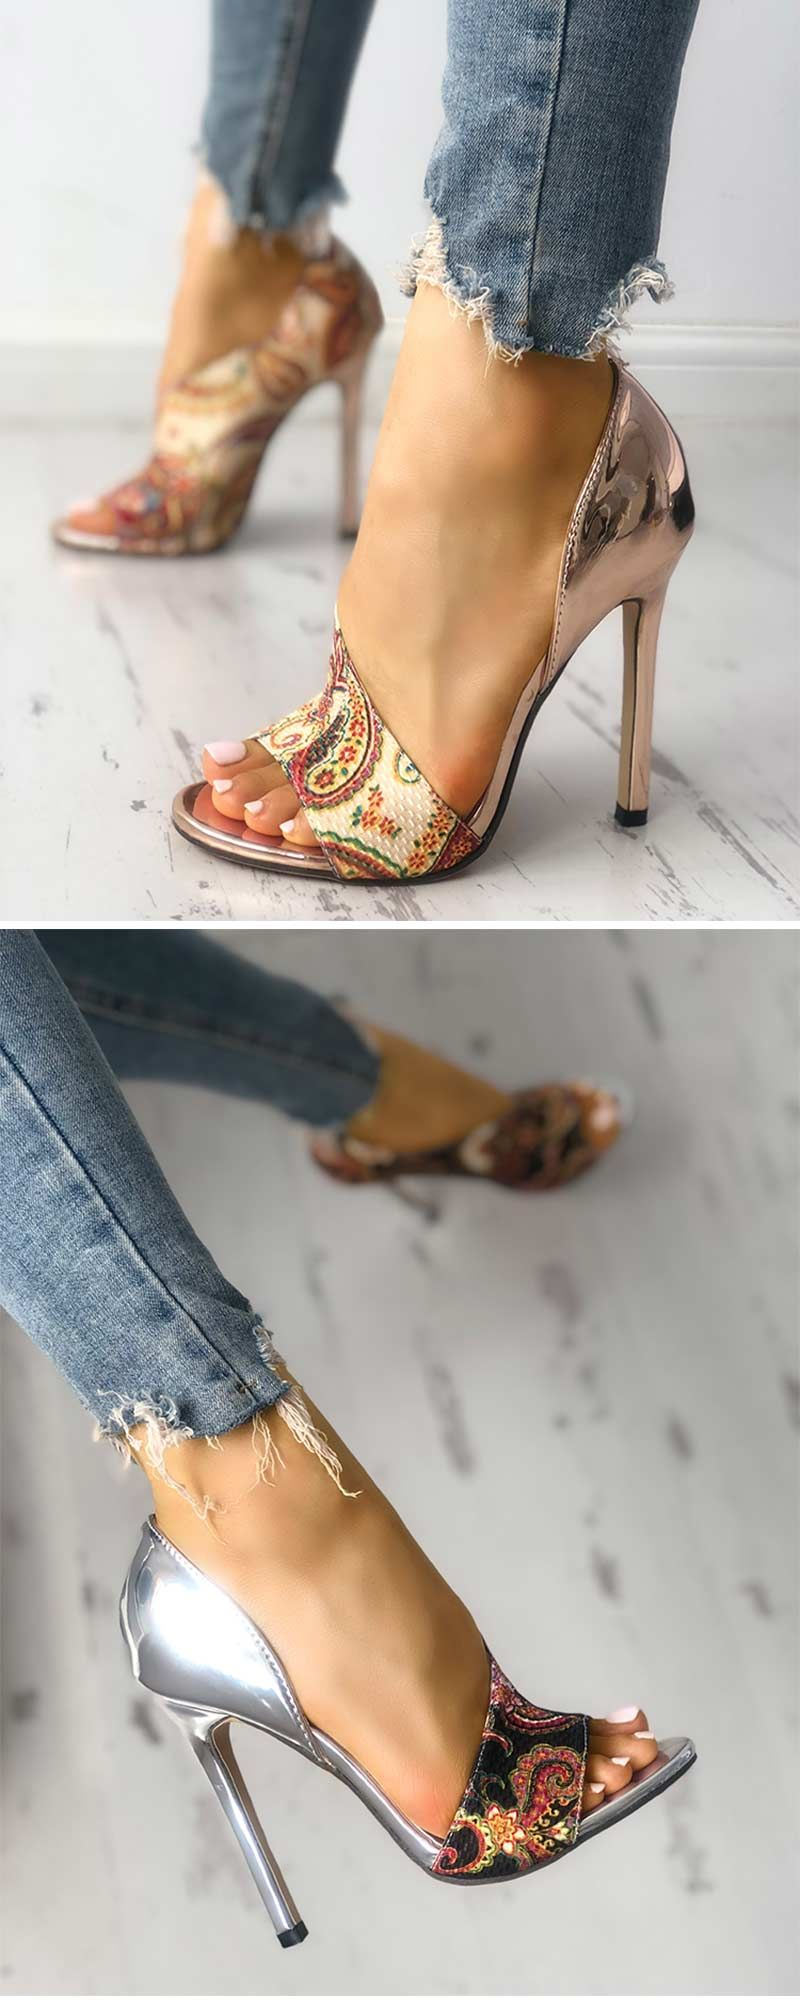 release date 7962f 68ee8 Zapatos Pump, Zapatos De Moda, Zapatos Sexys, Estilo De Zapatos, Calzado  Mujer